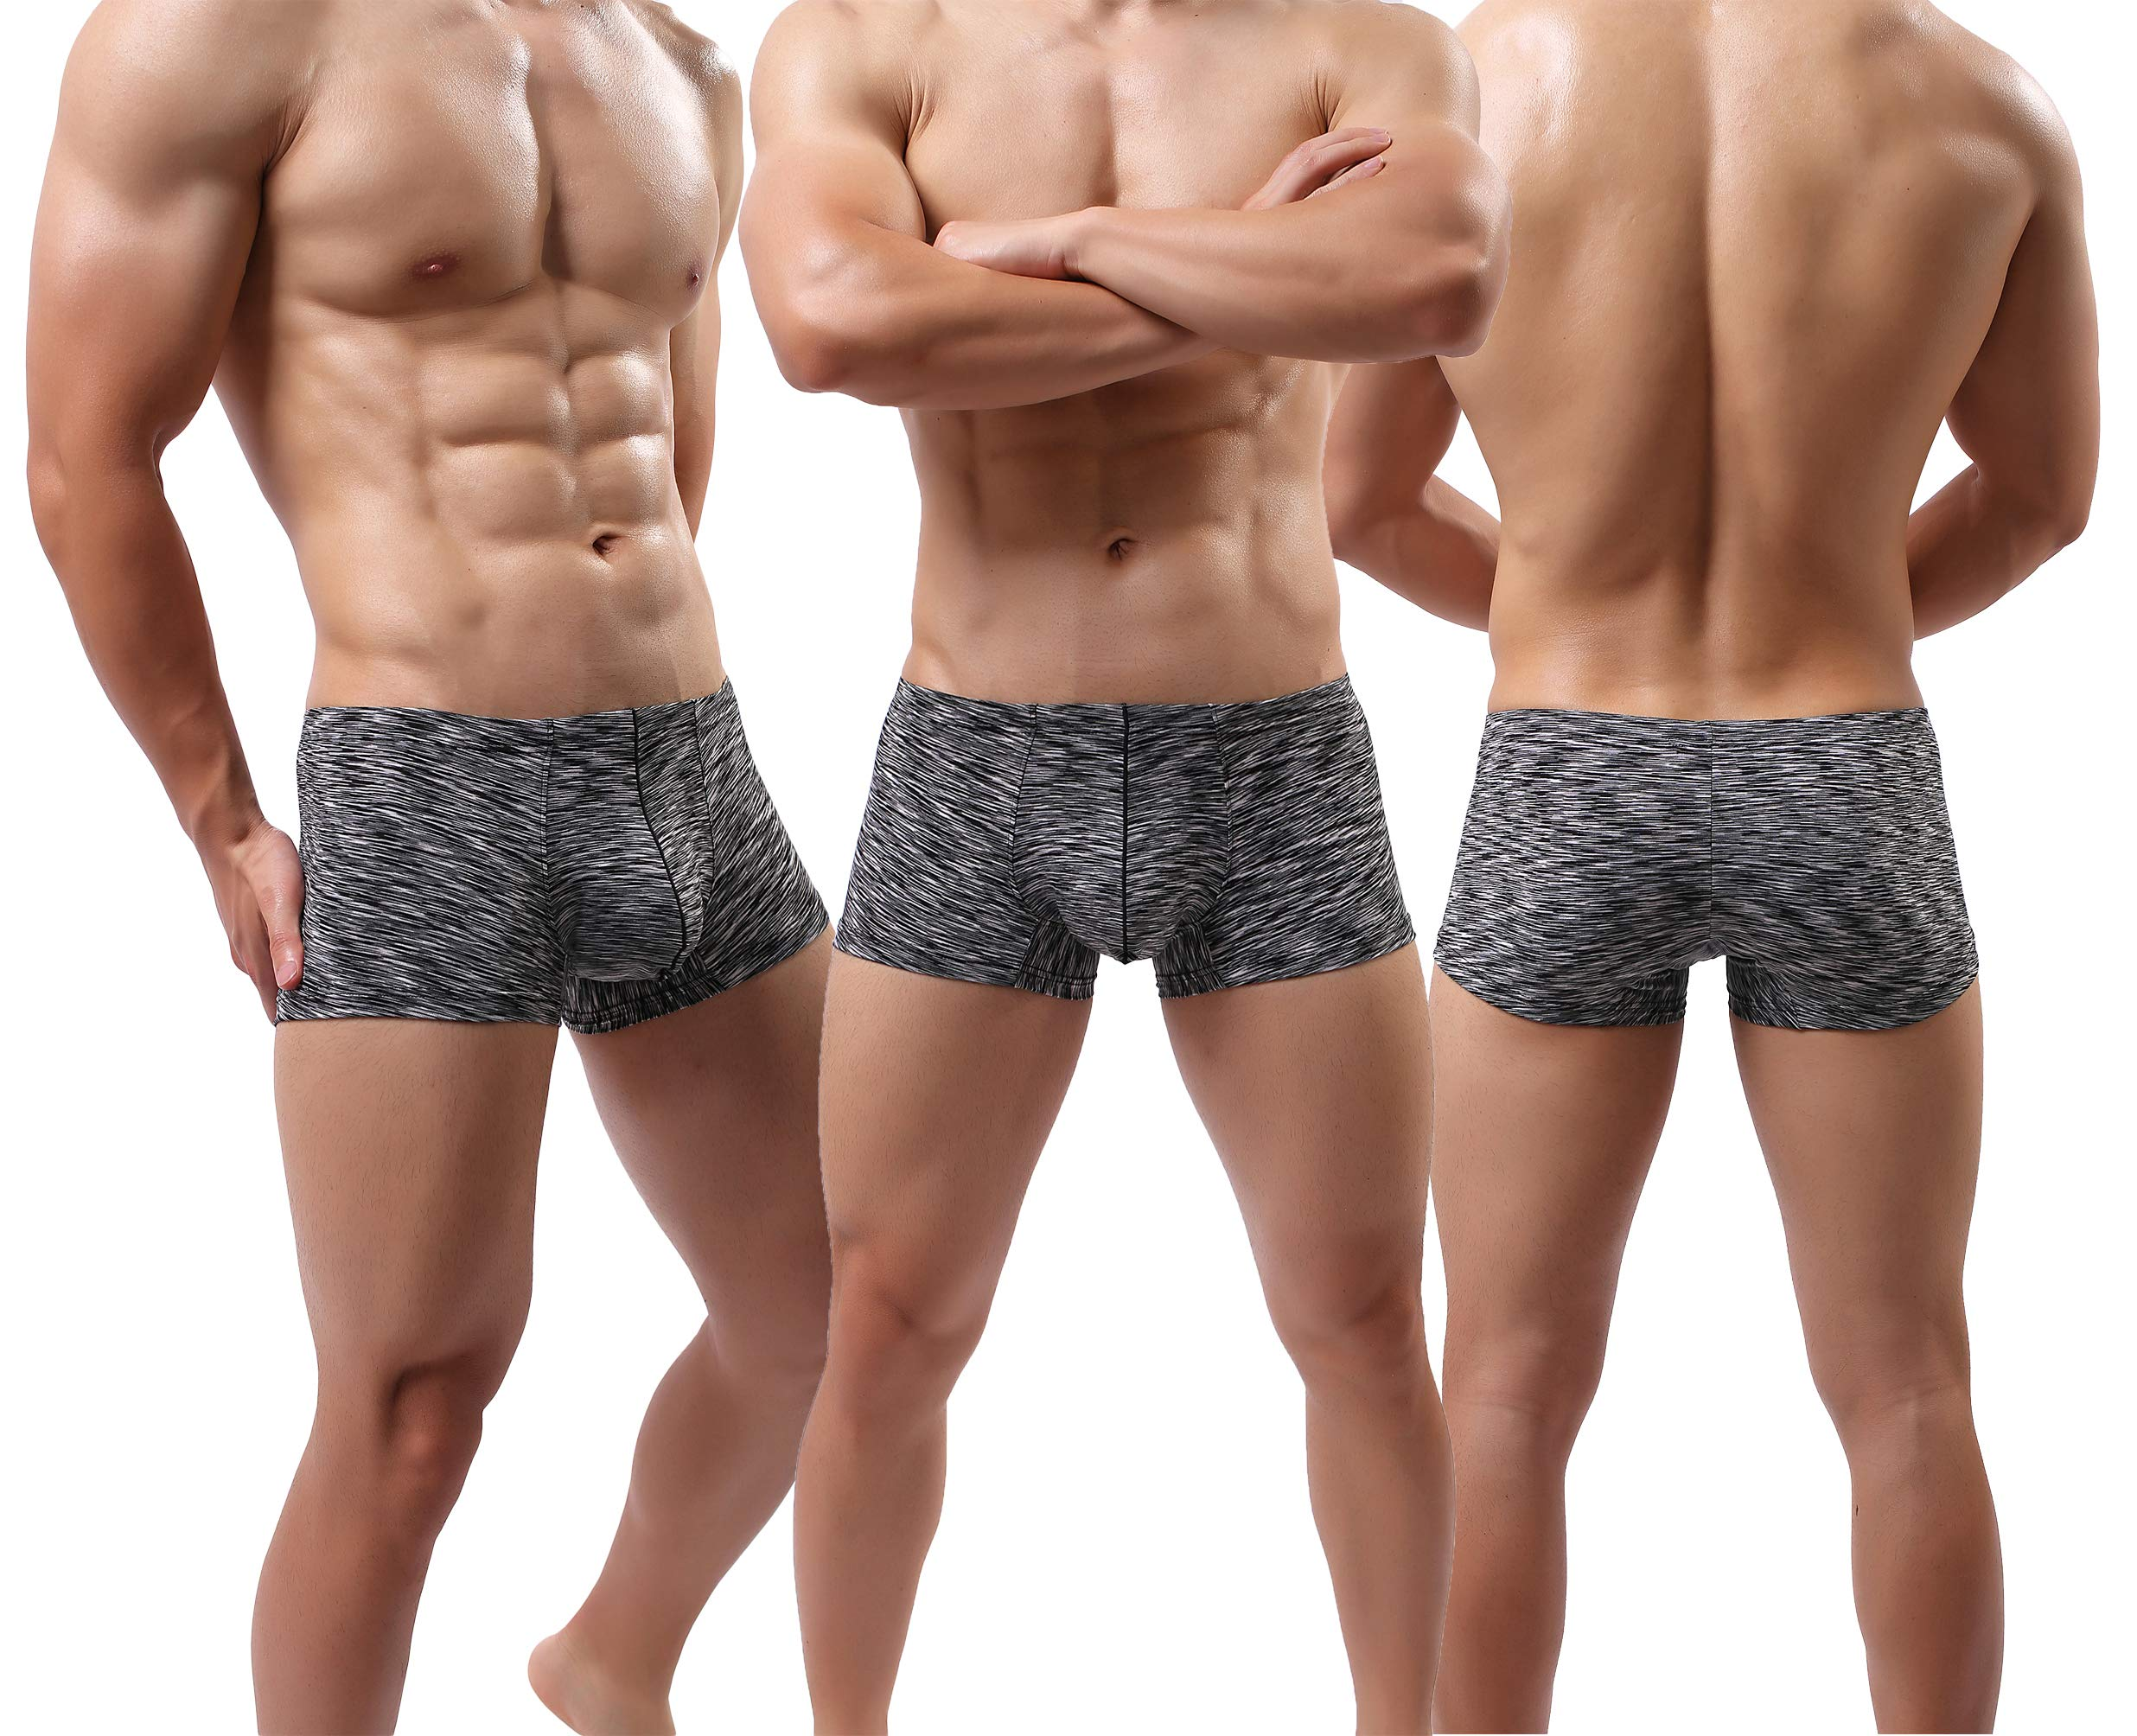 MAKEIIT Young Underwear X-Temp Boxers Guys Underwear Fitted Cool Boxer Briefs Men by MAKEIIT (Image #2)